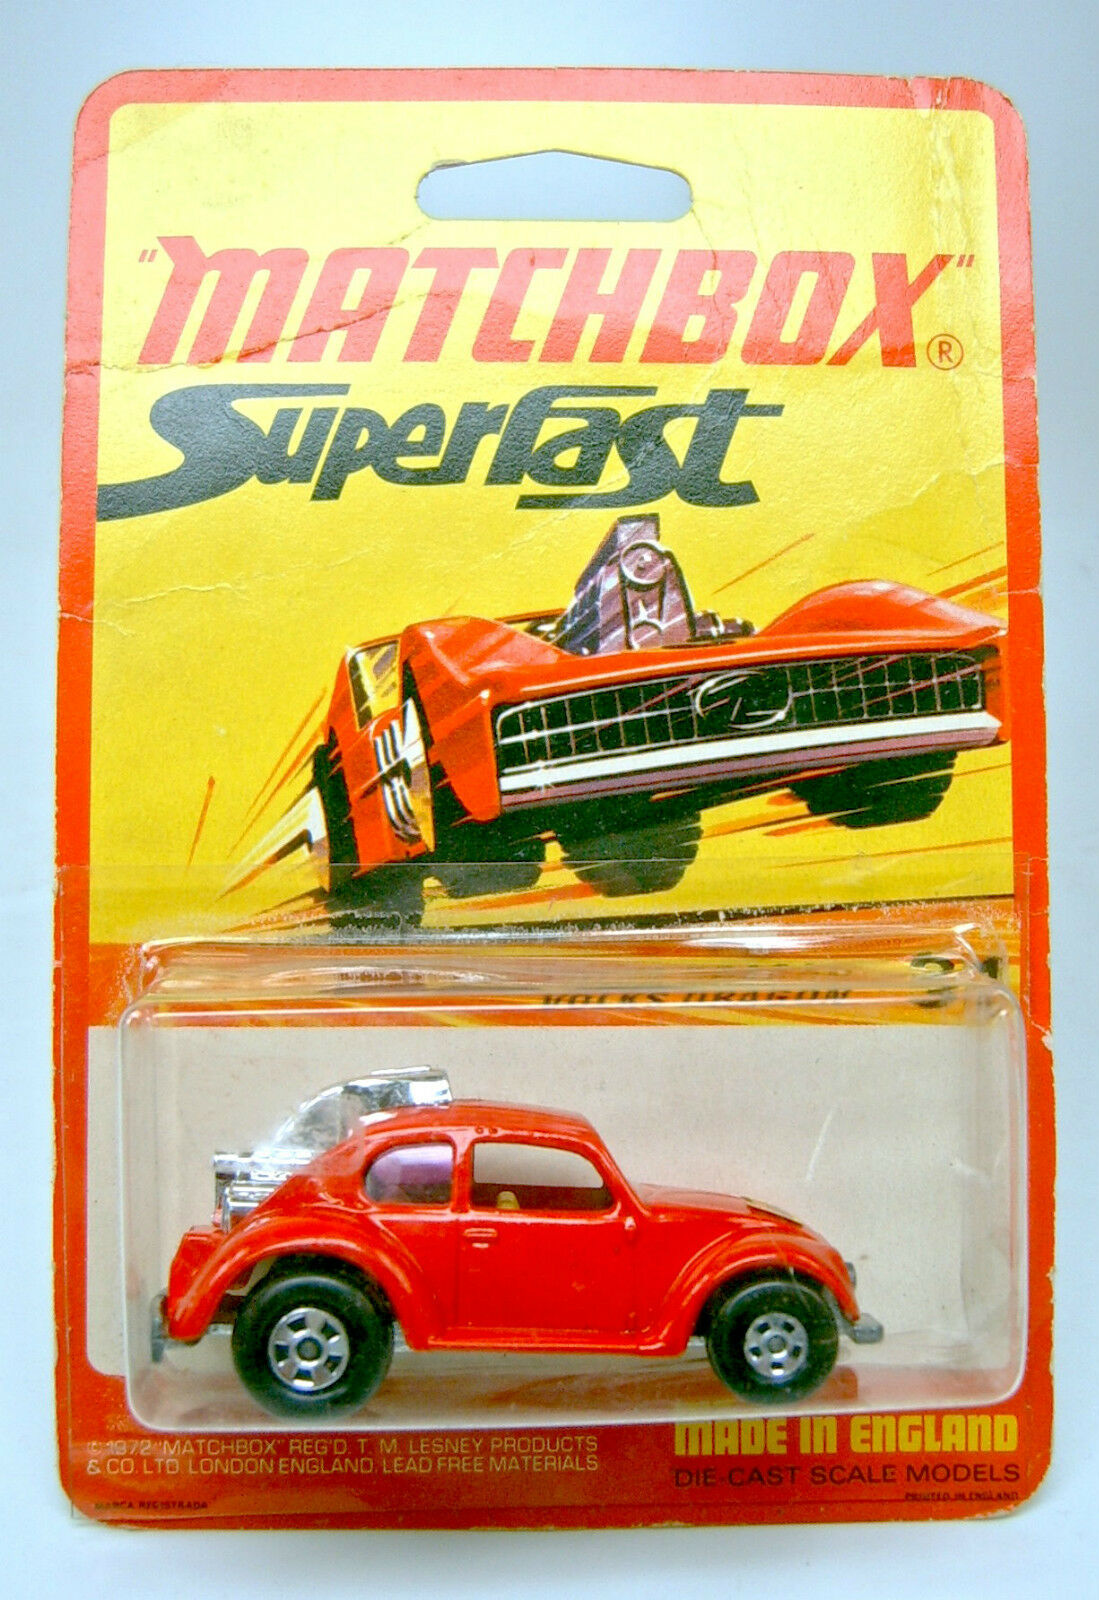 Matchbox superfast nr. 31b volks drachen auf seltener 1972 blisterkarte